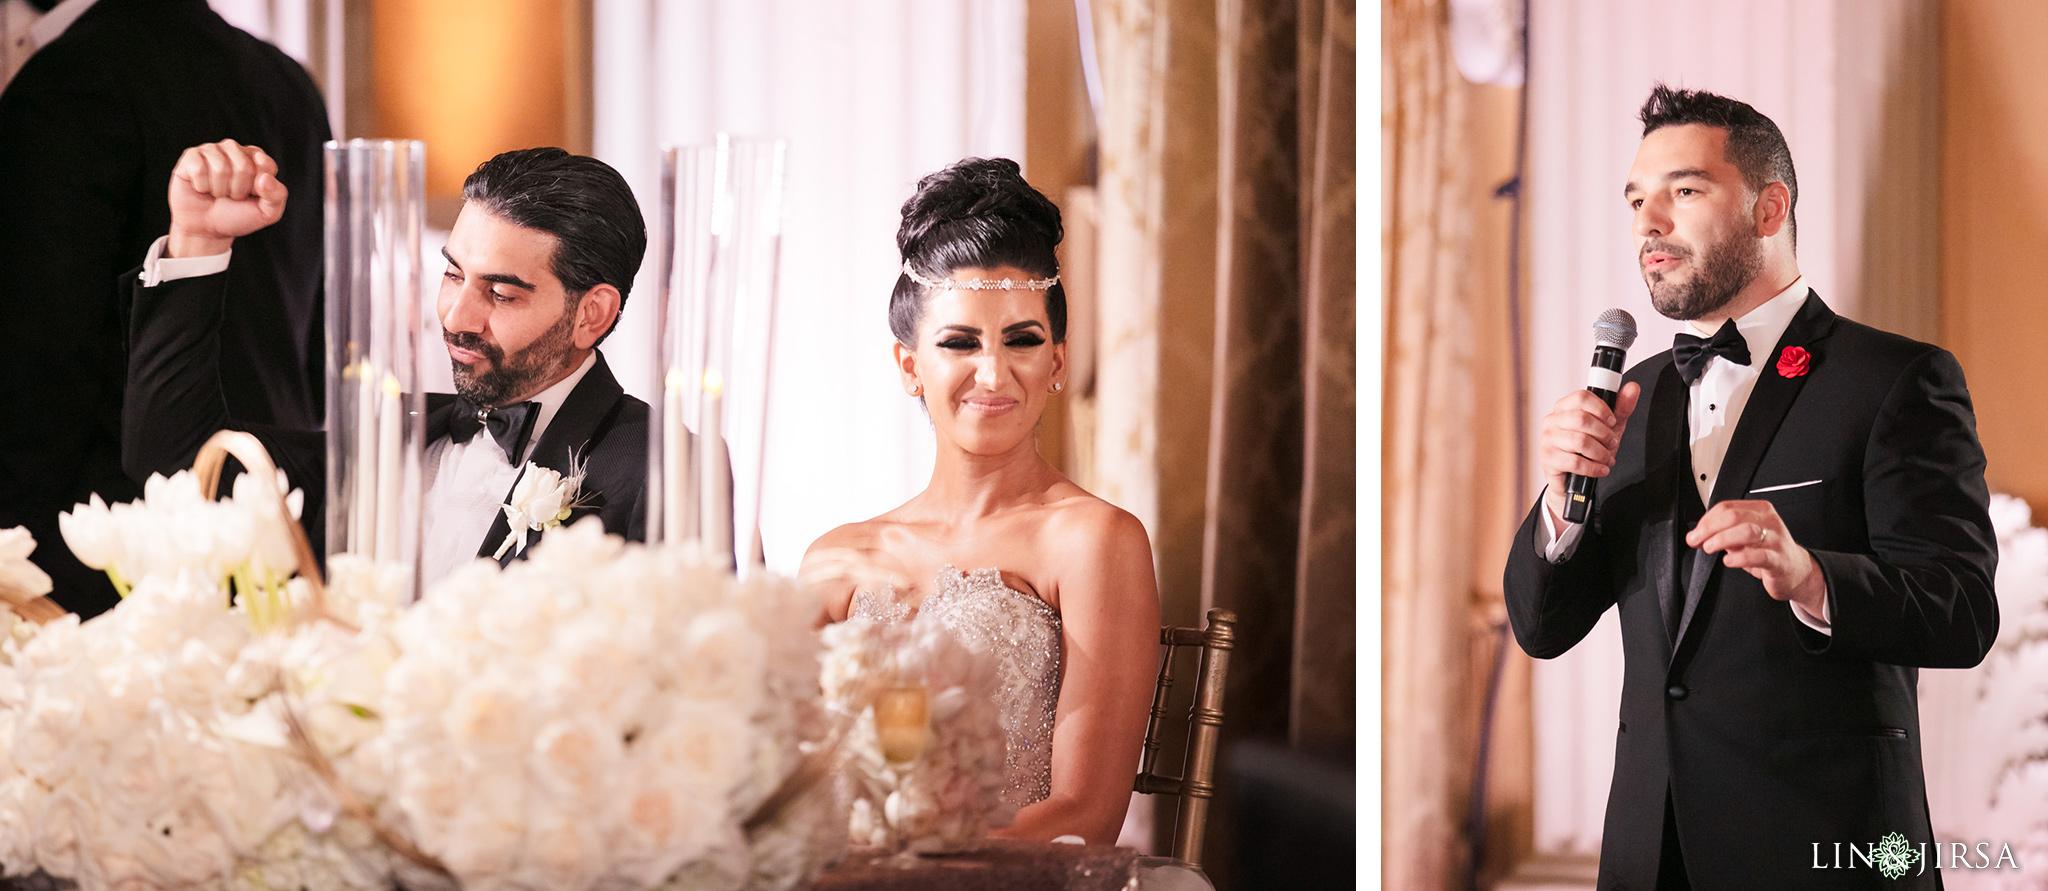 30 Biltmore Hotel Los Angeles Wedding Photography